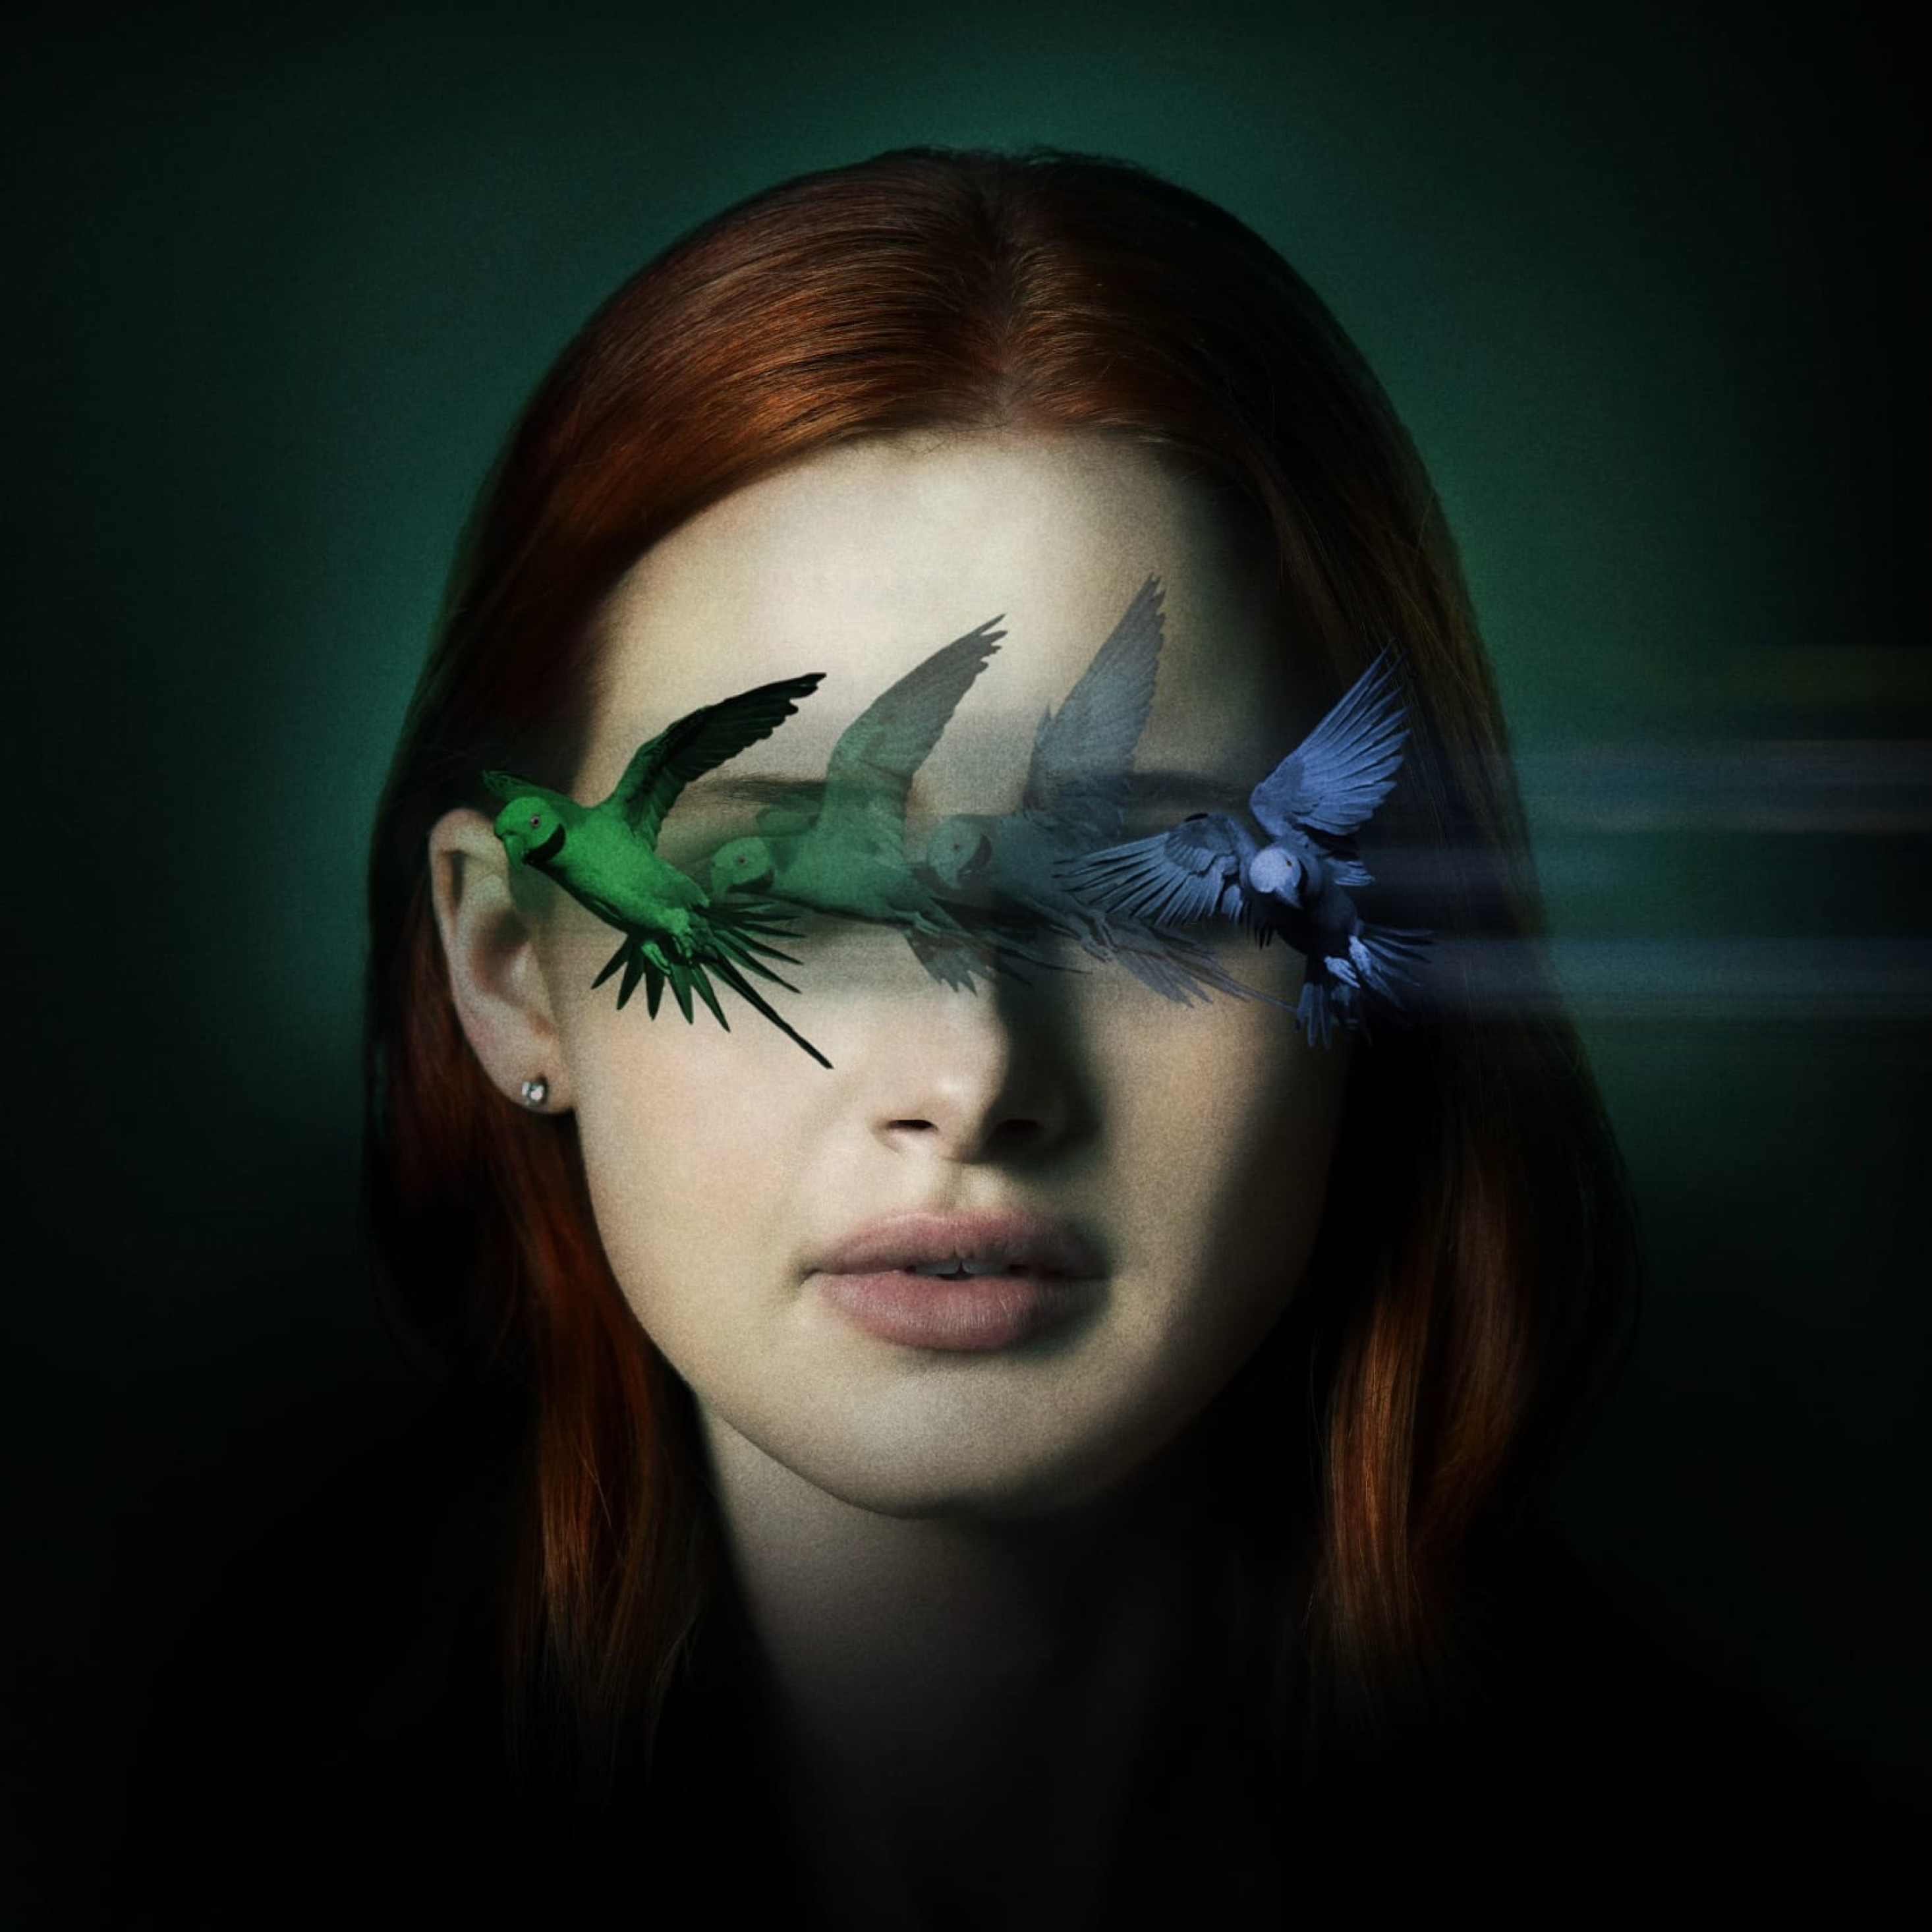 Madelaine Petsch Sightless Movie Wallpaper in 2932x2932 Resolution